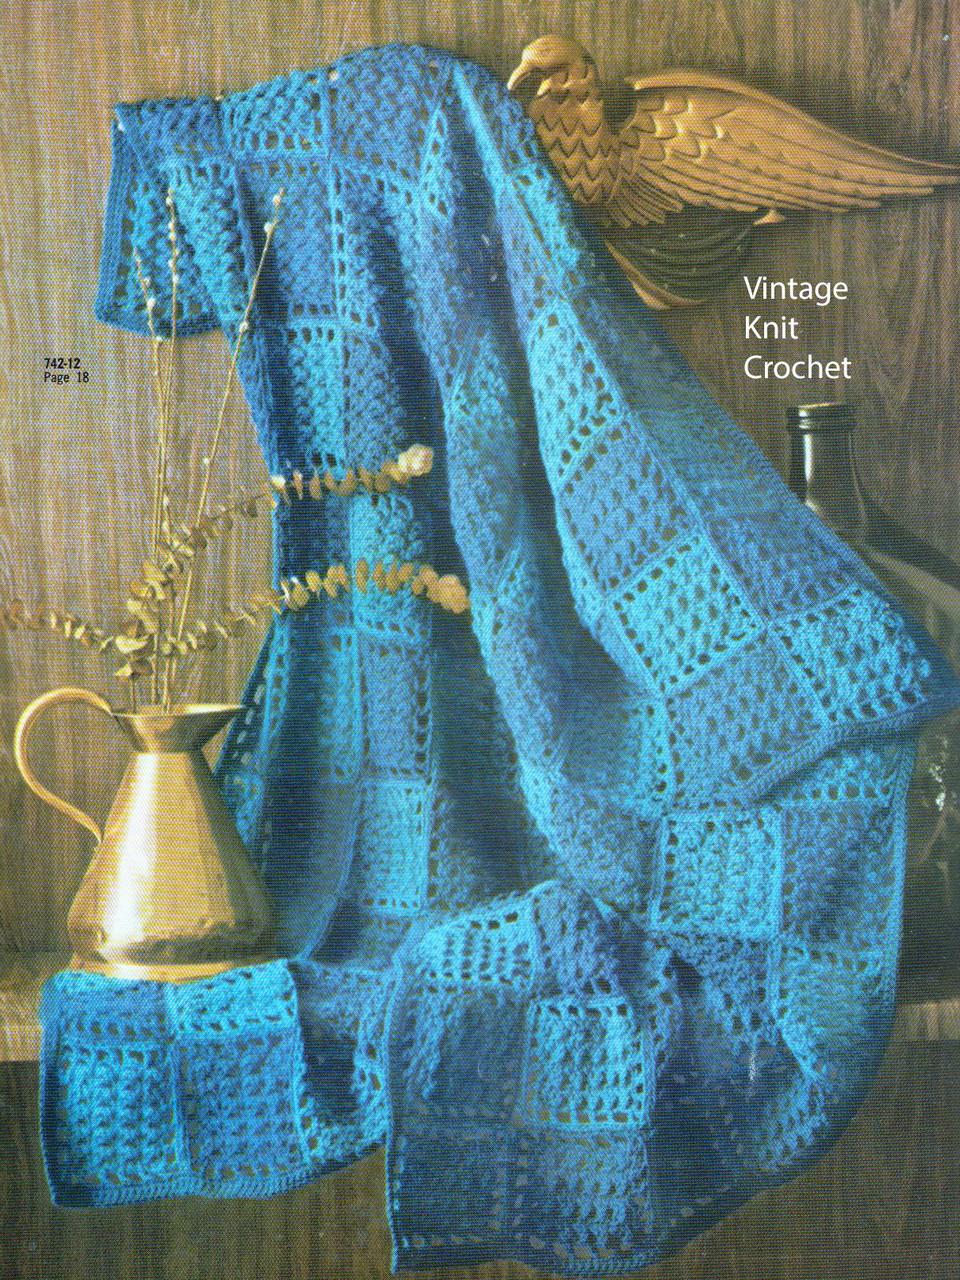 Easy Block Crochet Afghan Pattern No 742-12